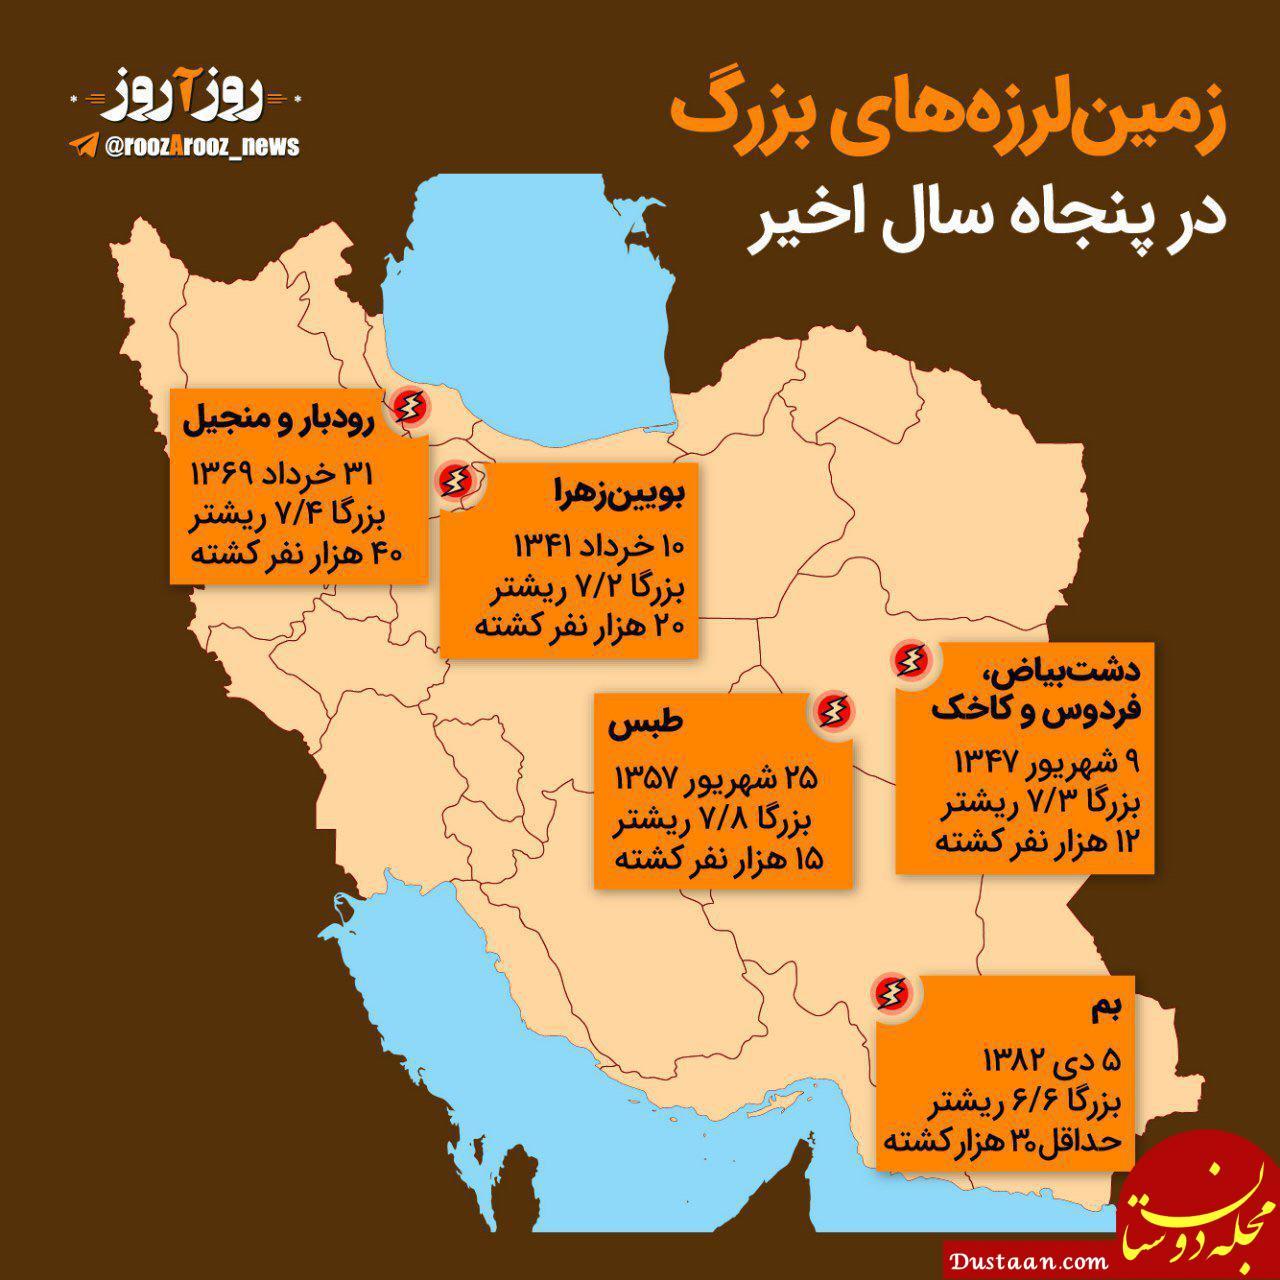 www.dustaan.com زلزله های بزرگ ۵۰ سال اخیر ایران در یک نگاه